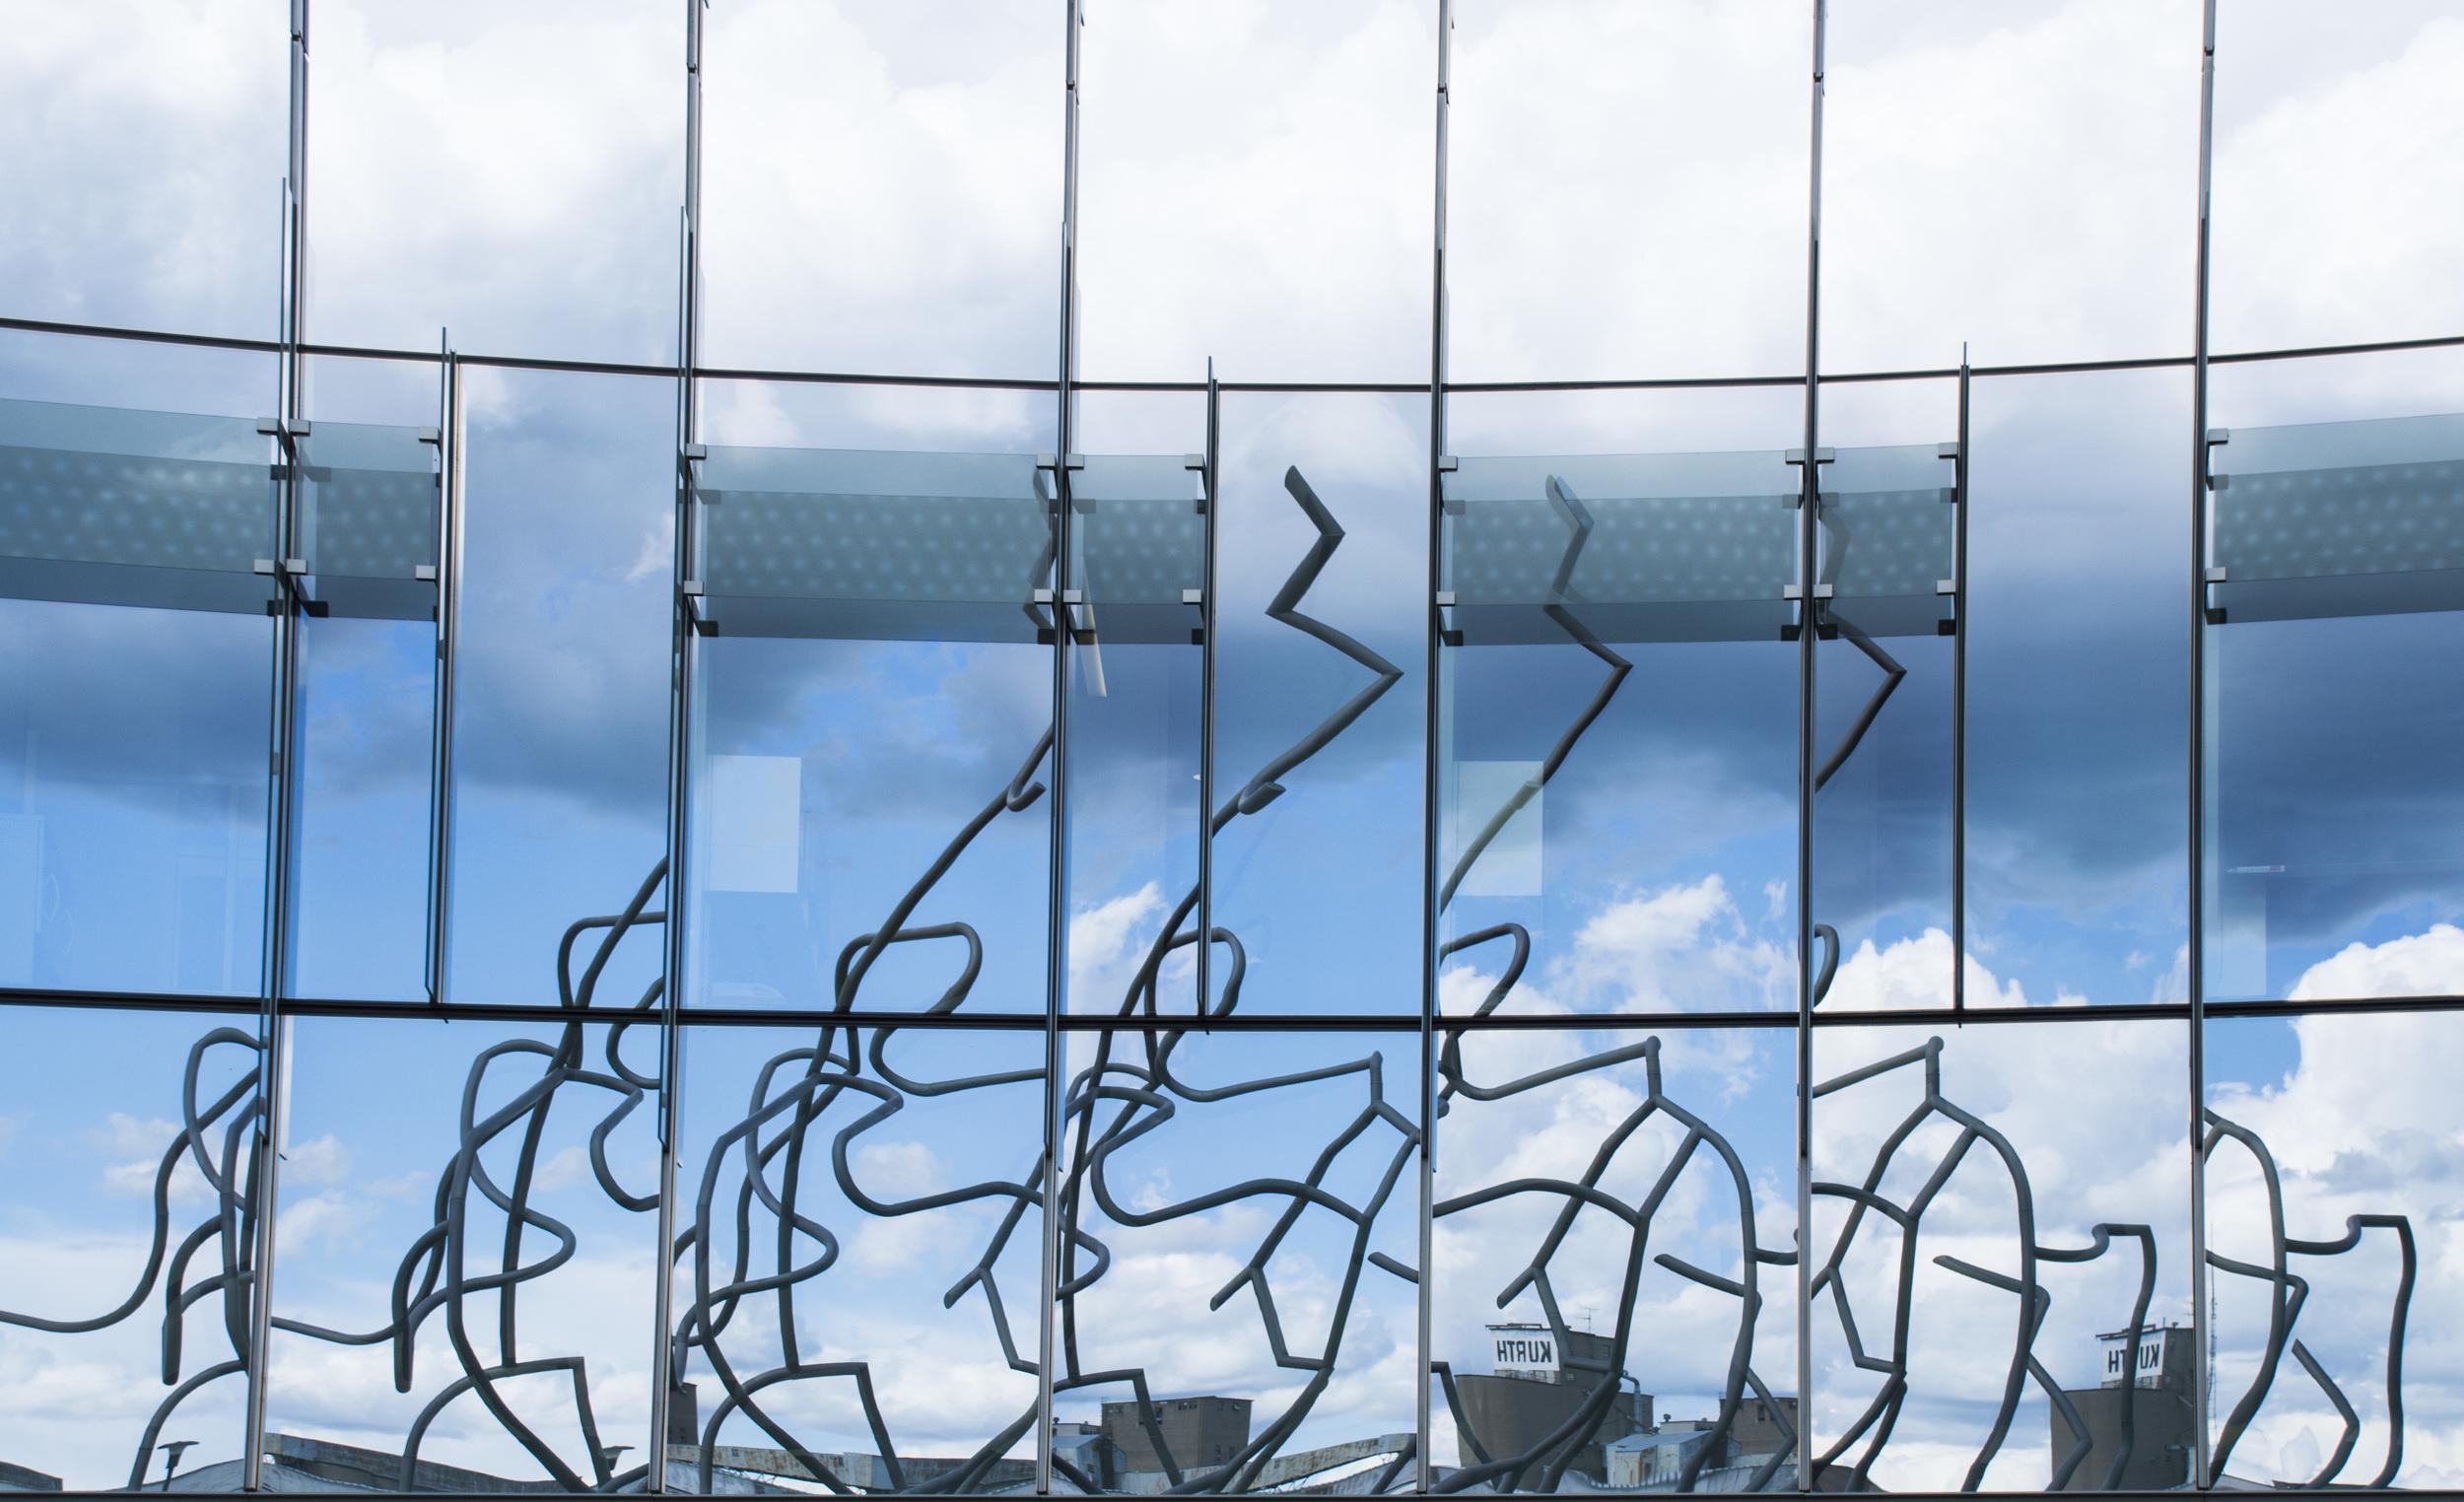 Adj-Poss-reflections..jpg